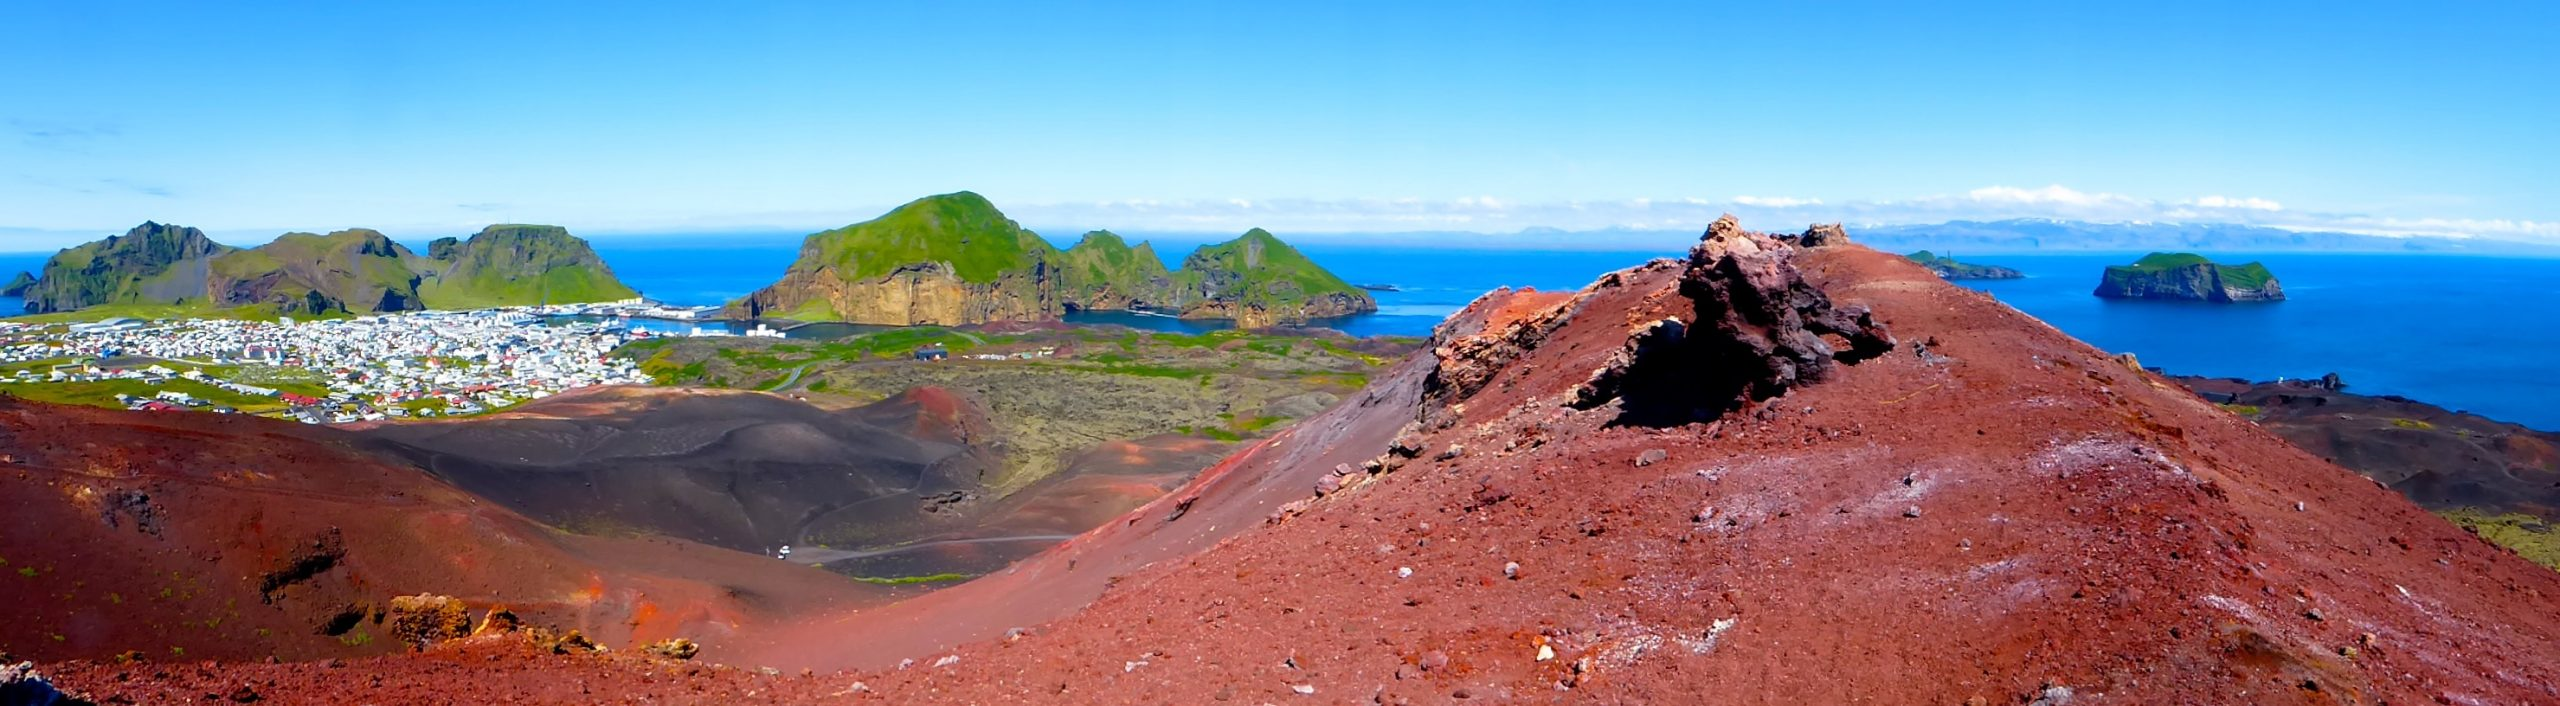 Farbige Vulkanlandschaft auf den Westmänner Inseln